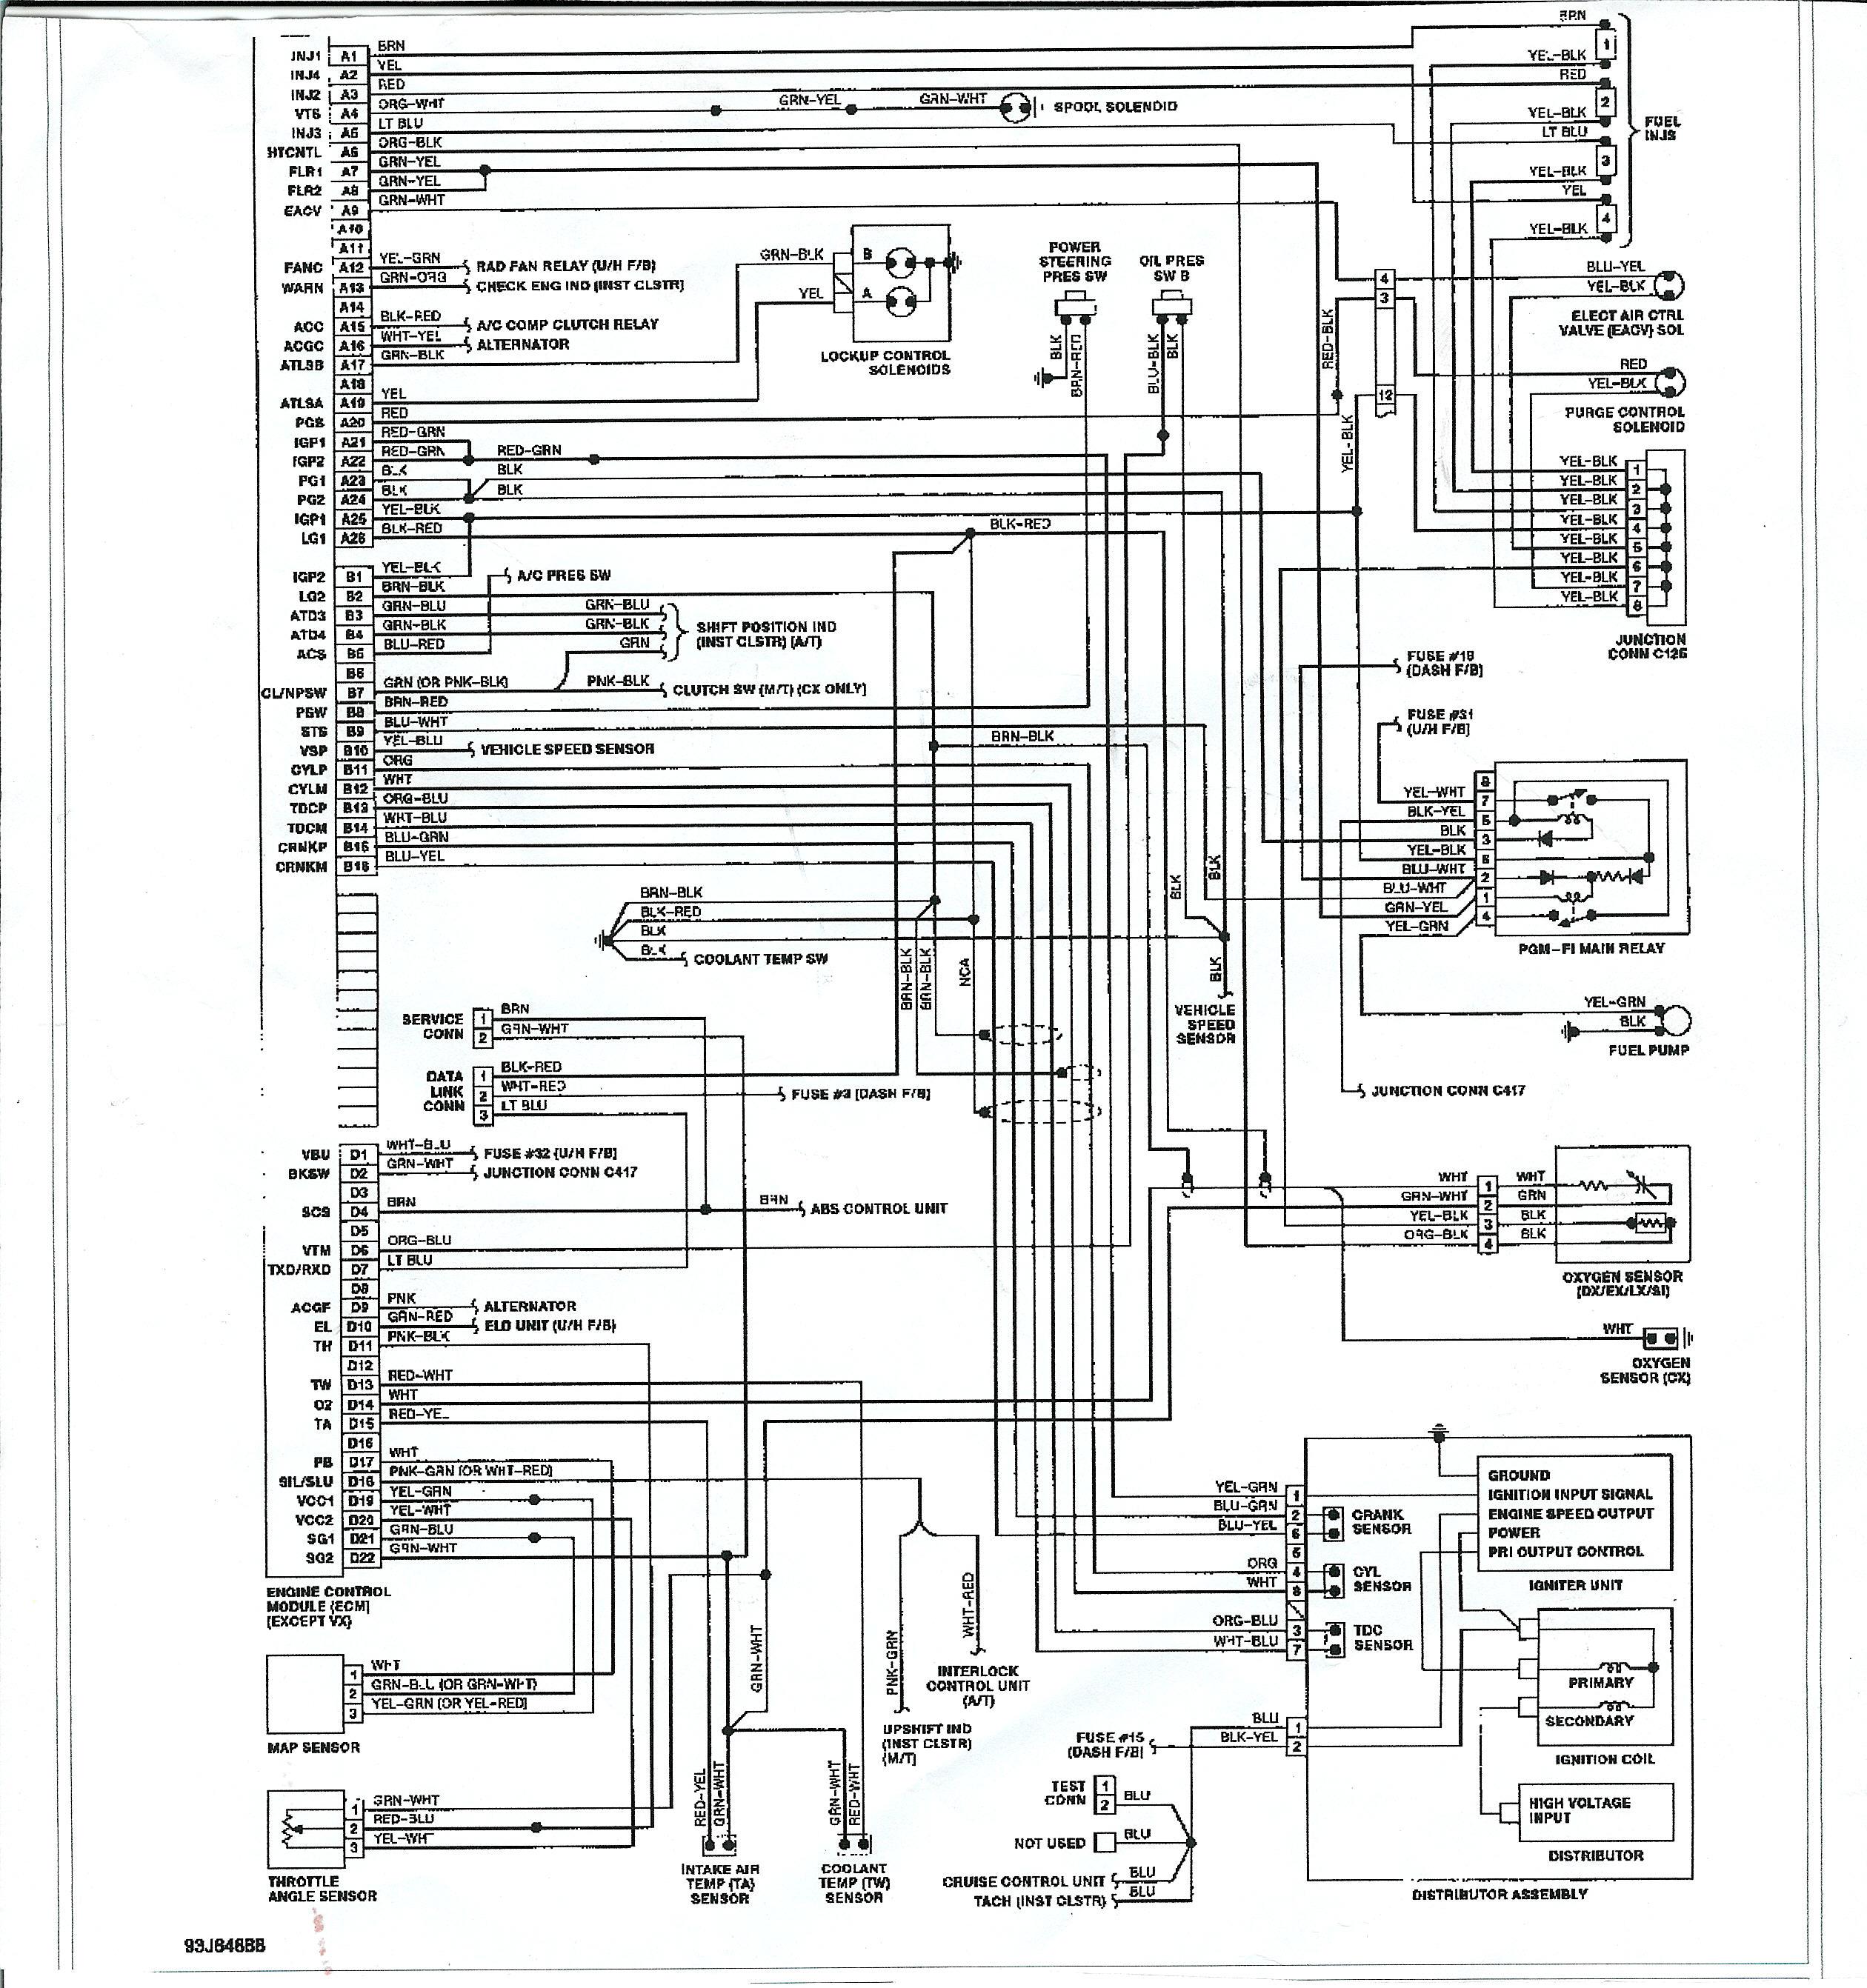 OF_1716] Honda Civic Wiring Diagram Honda Car Wiring Diagram 2000 Honda  CivicKnie Xtern Ehir Nekout Expe Nnigh Benkeme Mohammedshrine Librar Wiring 101